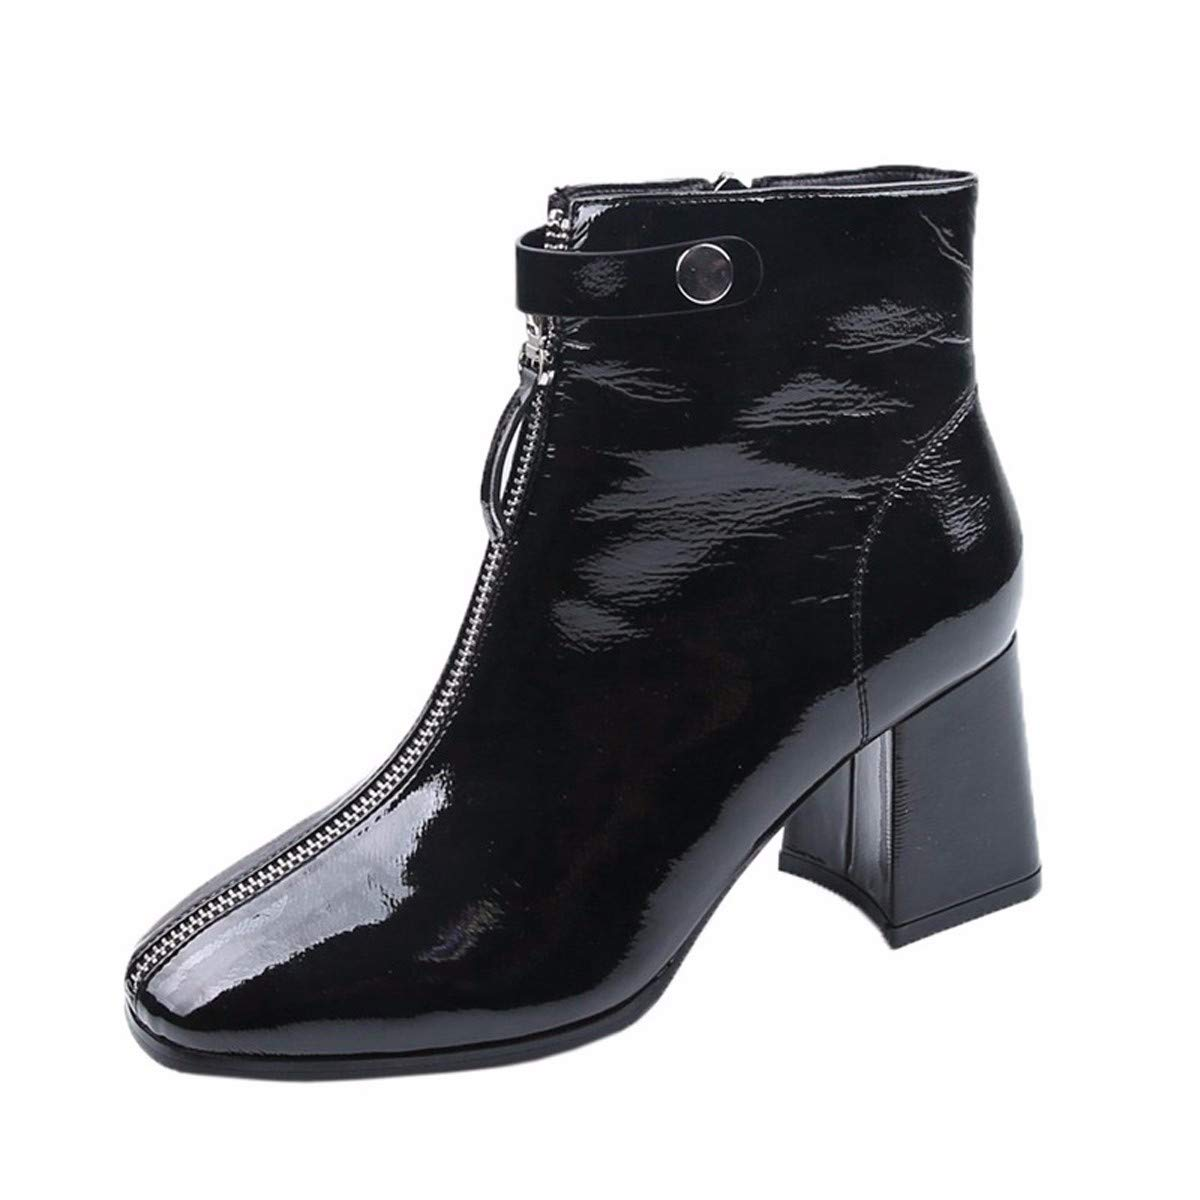 LBTSQ Damenschuhe Platz Kopf Kurze Stiefel Heel 6 cm Nahe Bei Bloßen Stiefel Winter Dicke Sohle 100 Sätze Samt Martin Stiefel